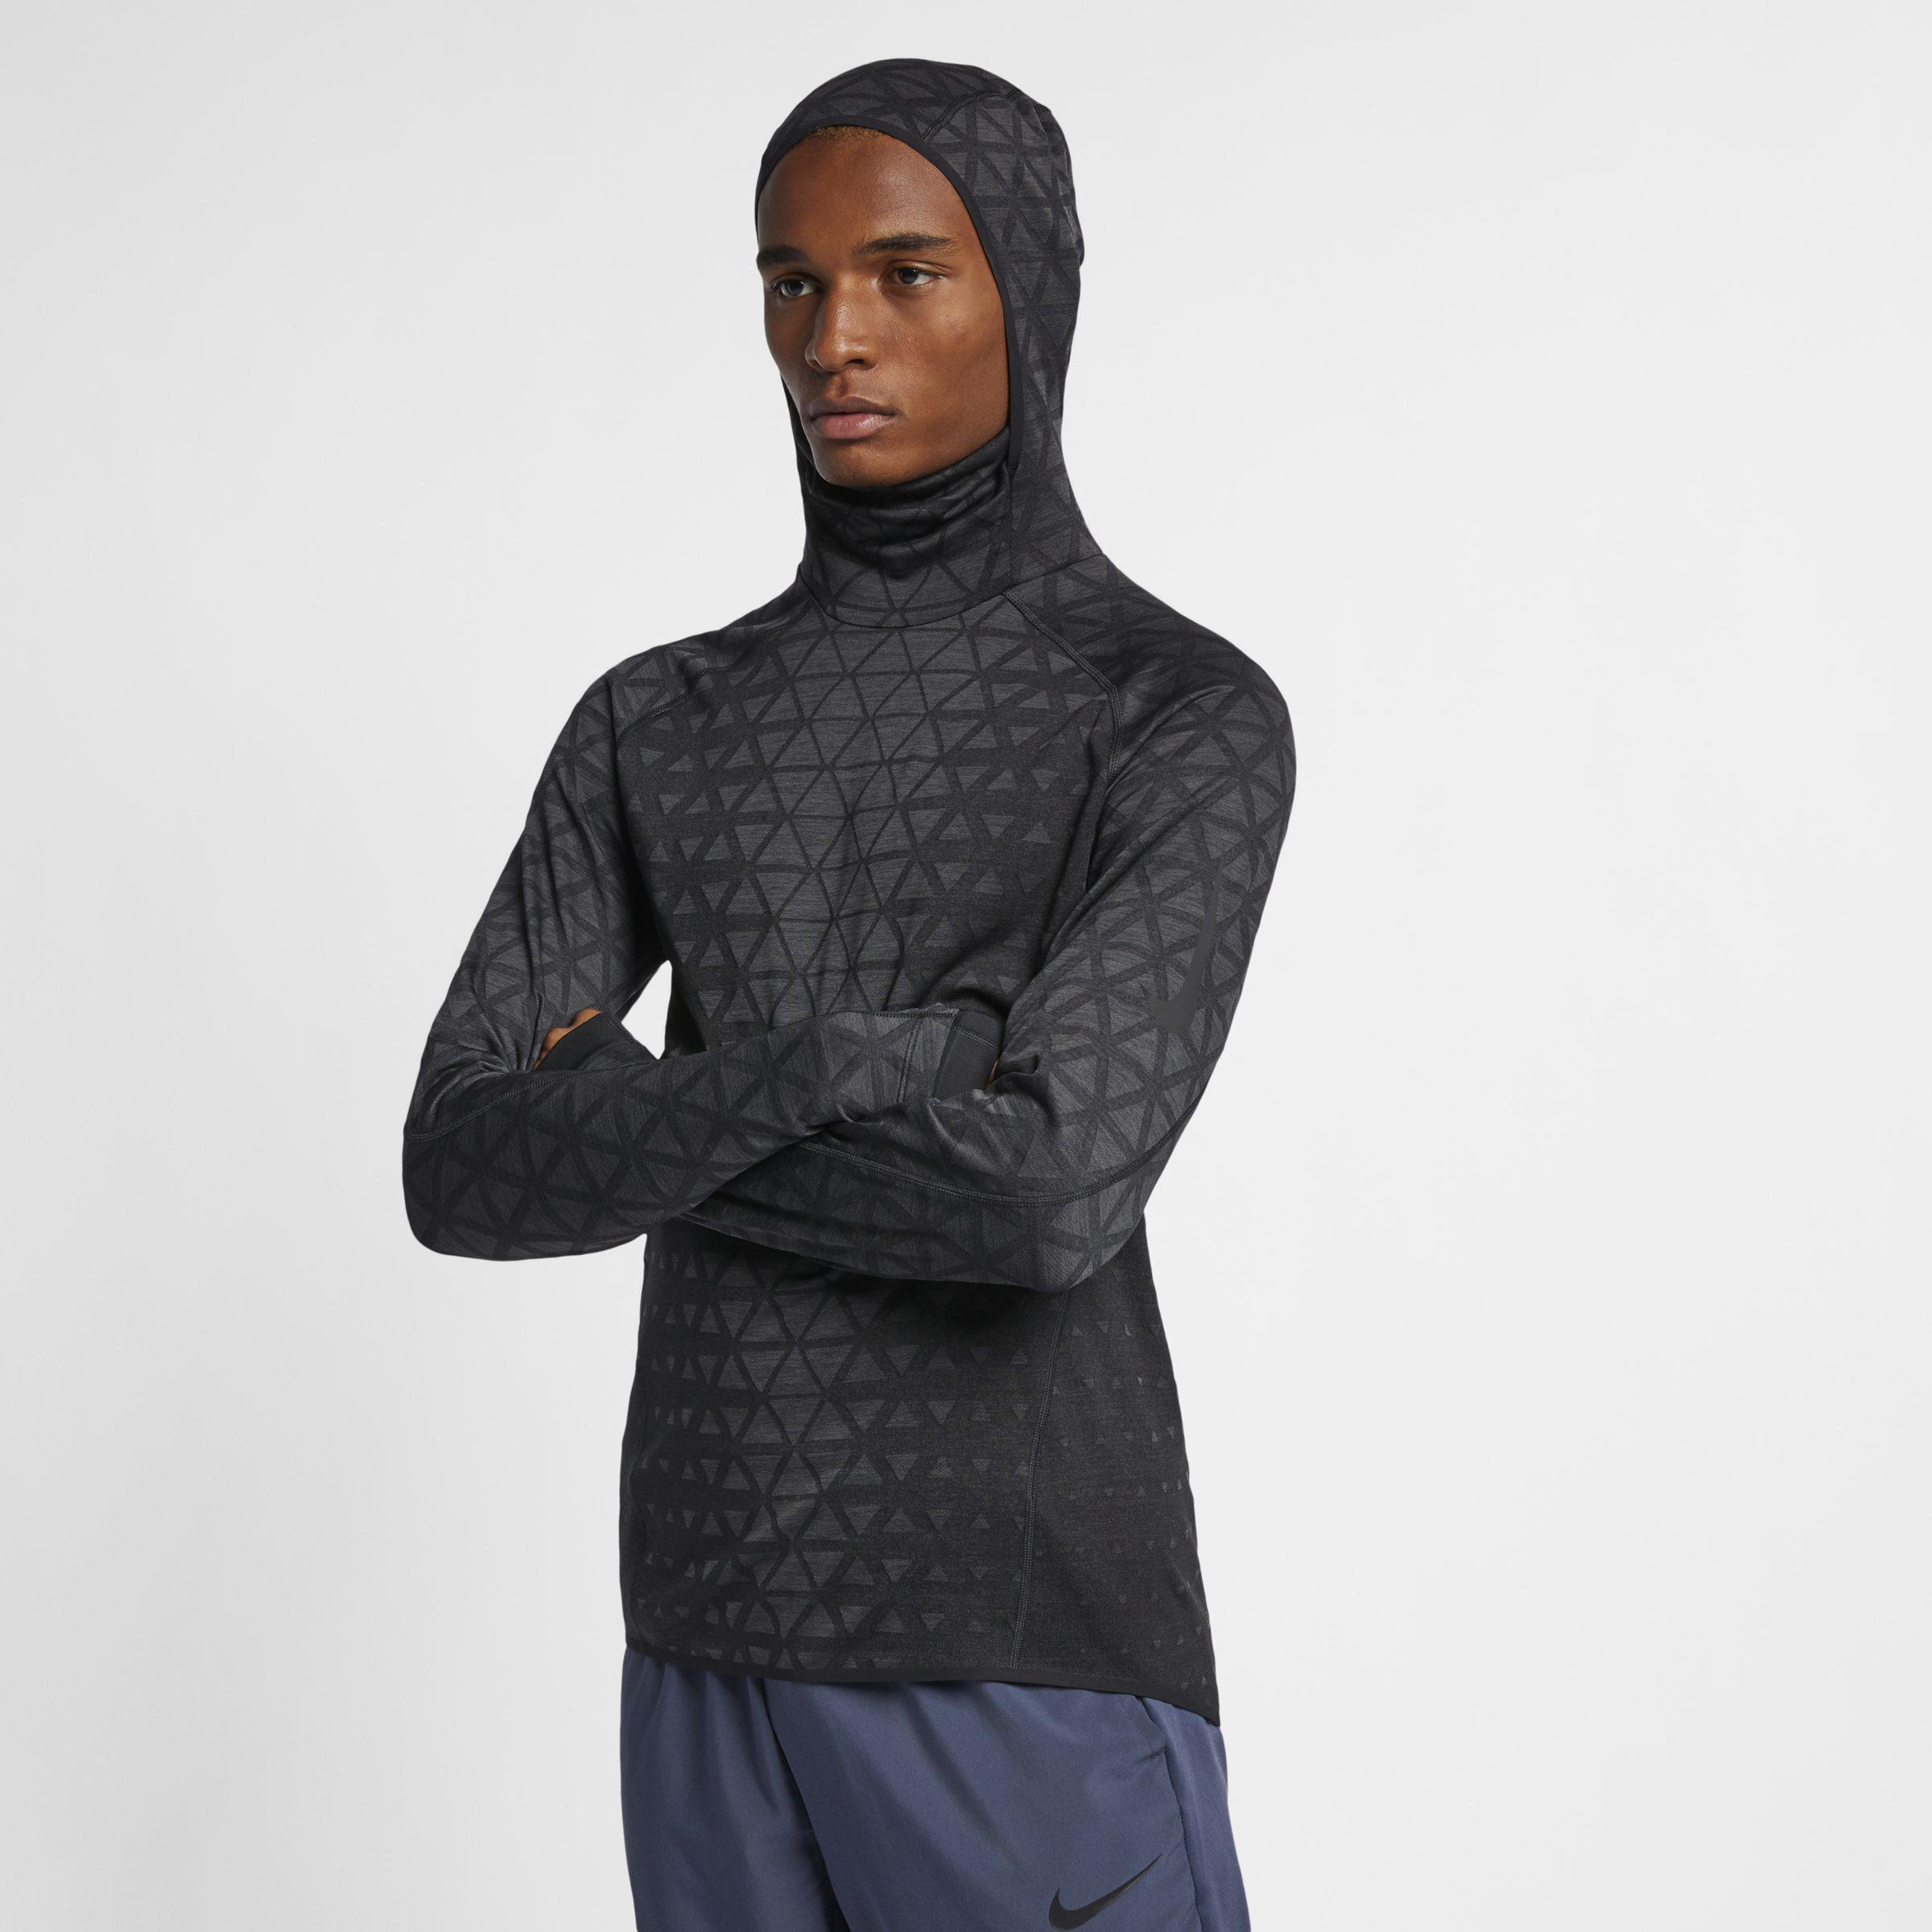 Antemano Barrio Discriminación  Nike Therma-sphere Premium Long-sleeve Training Top in Black for Men - Lyst